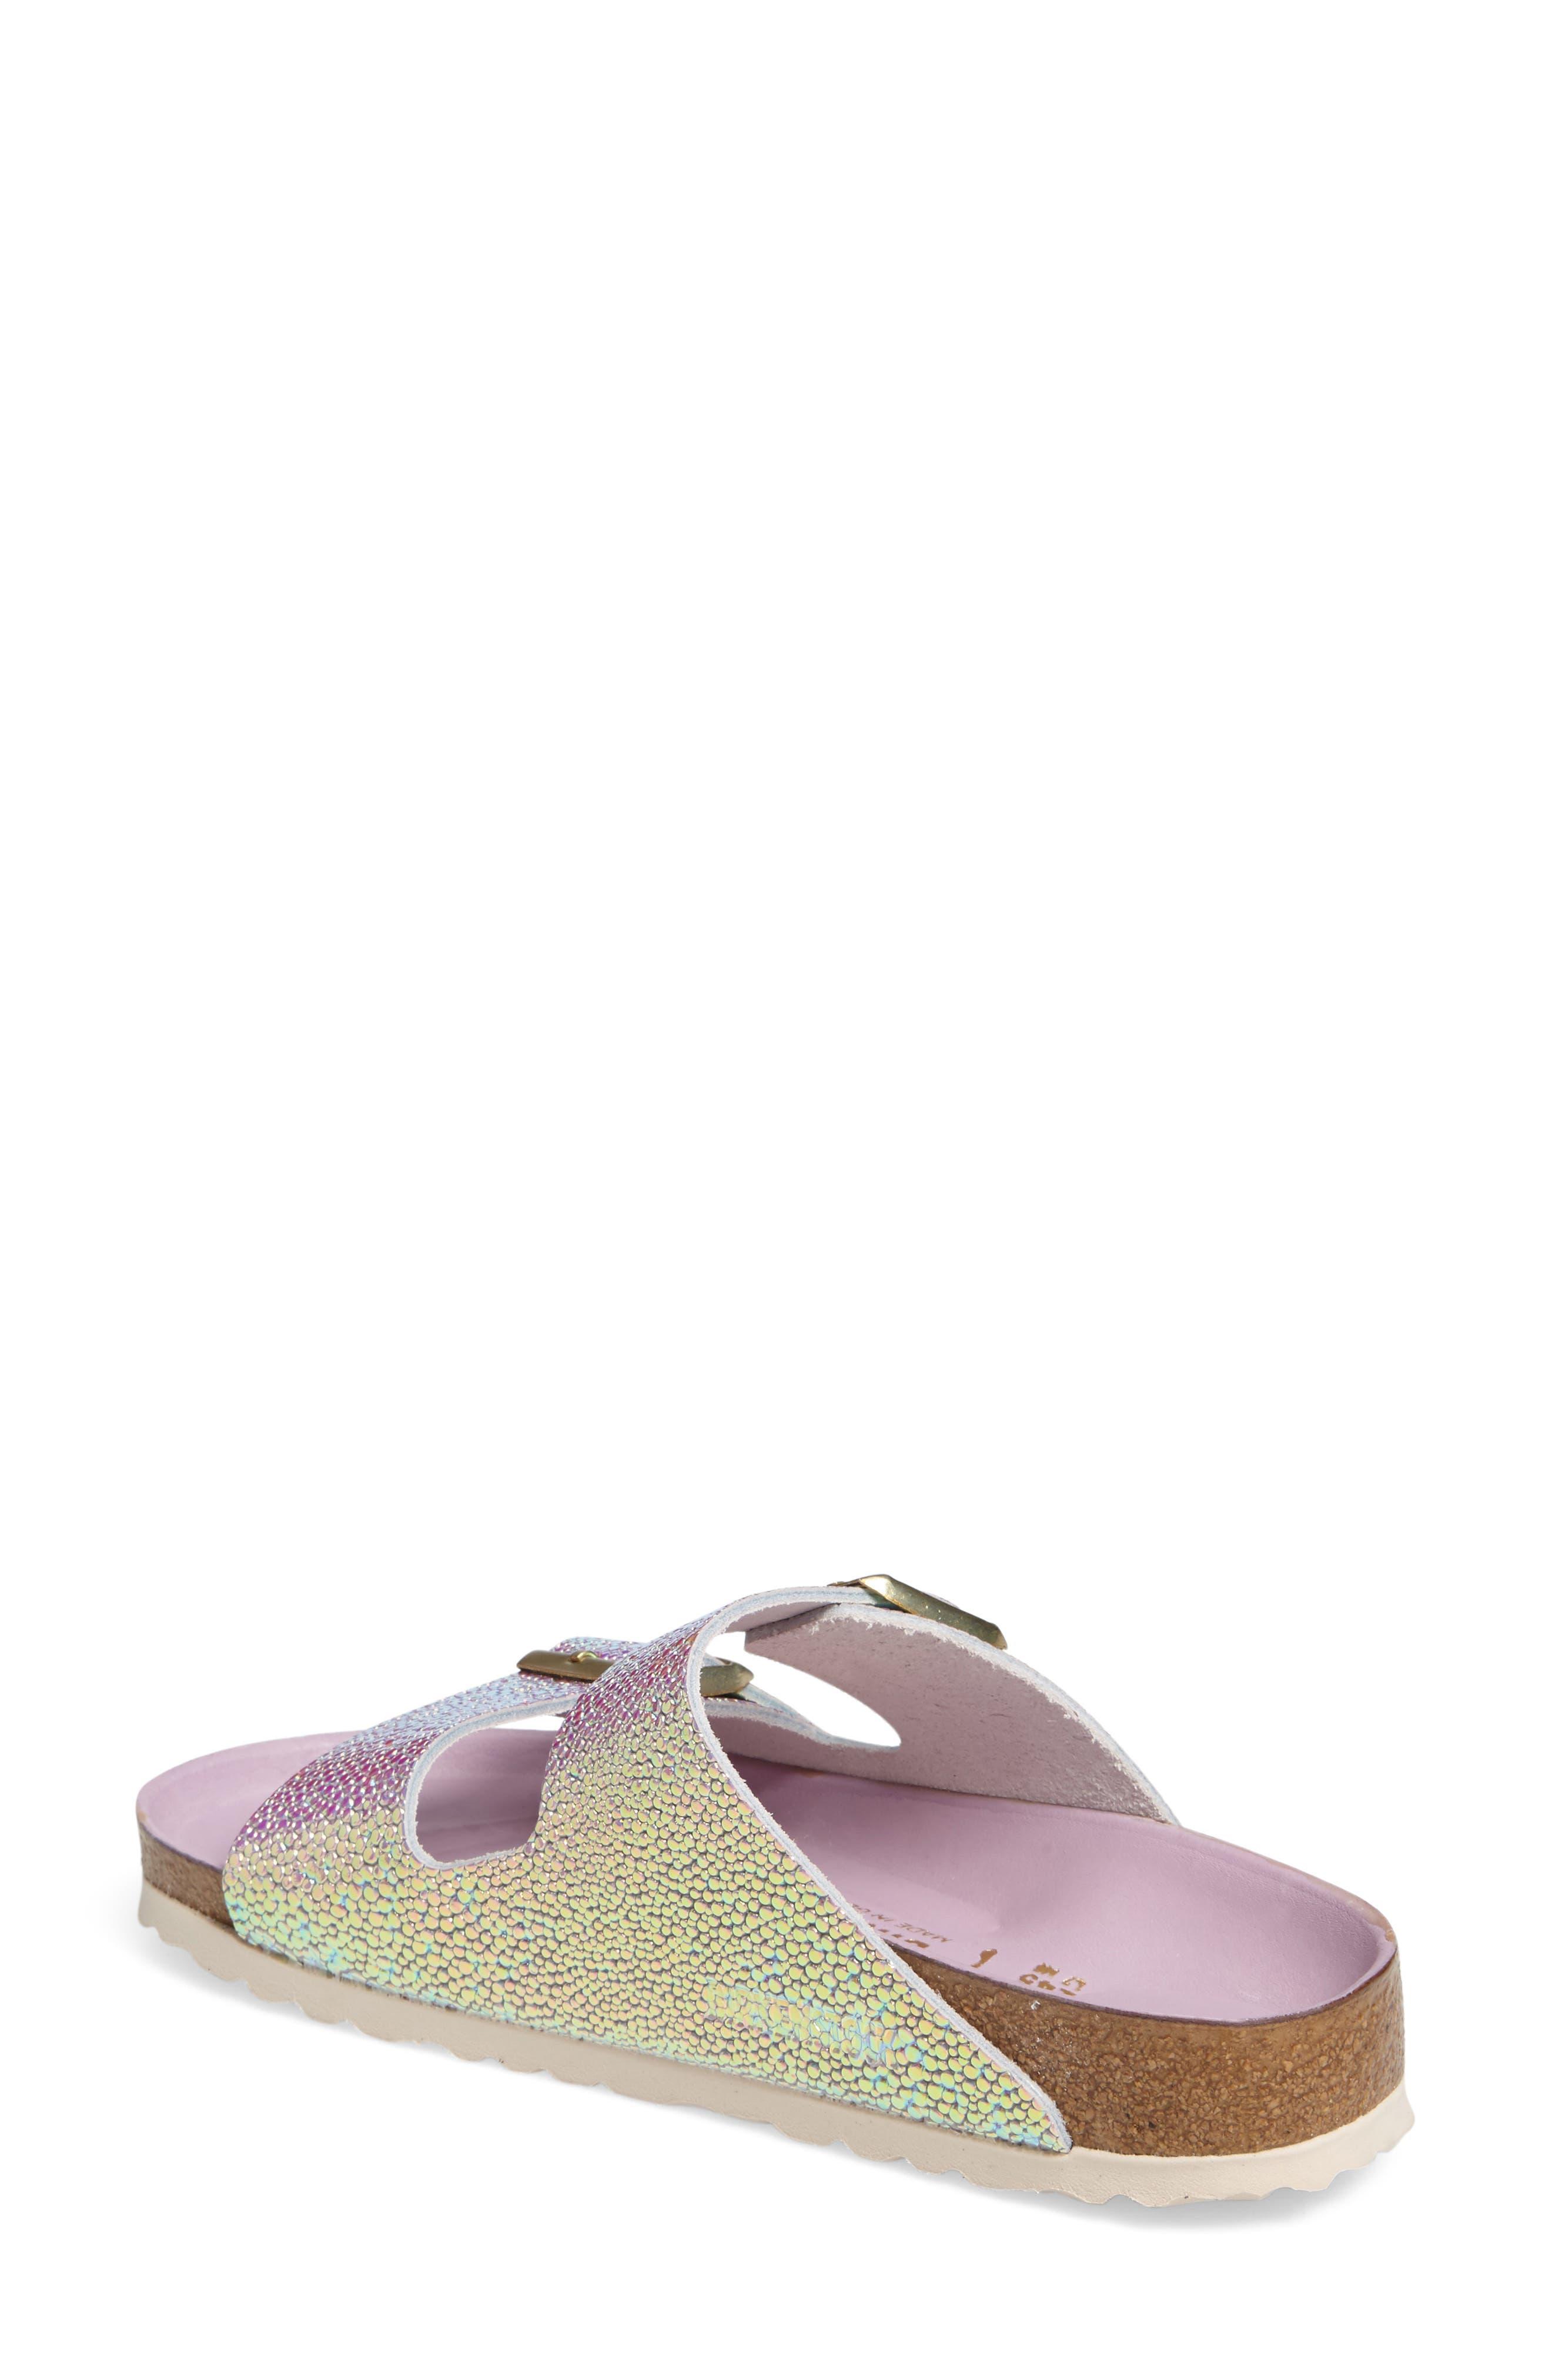 Alternate Image 2  - Birkenstock Arizona Lux Iridescent Slide Sandal (Women)